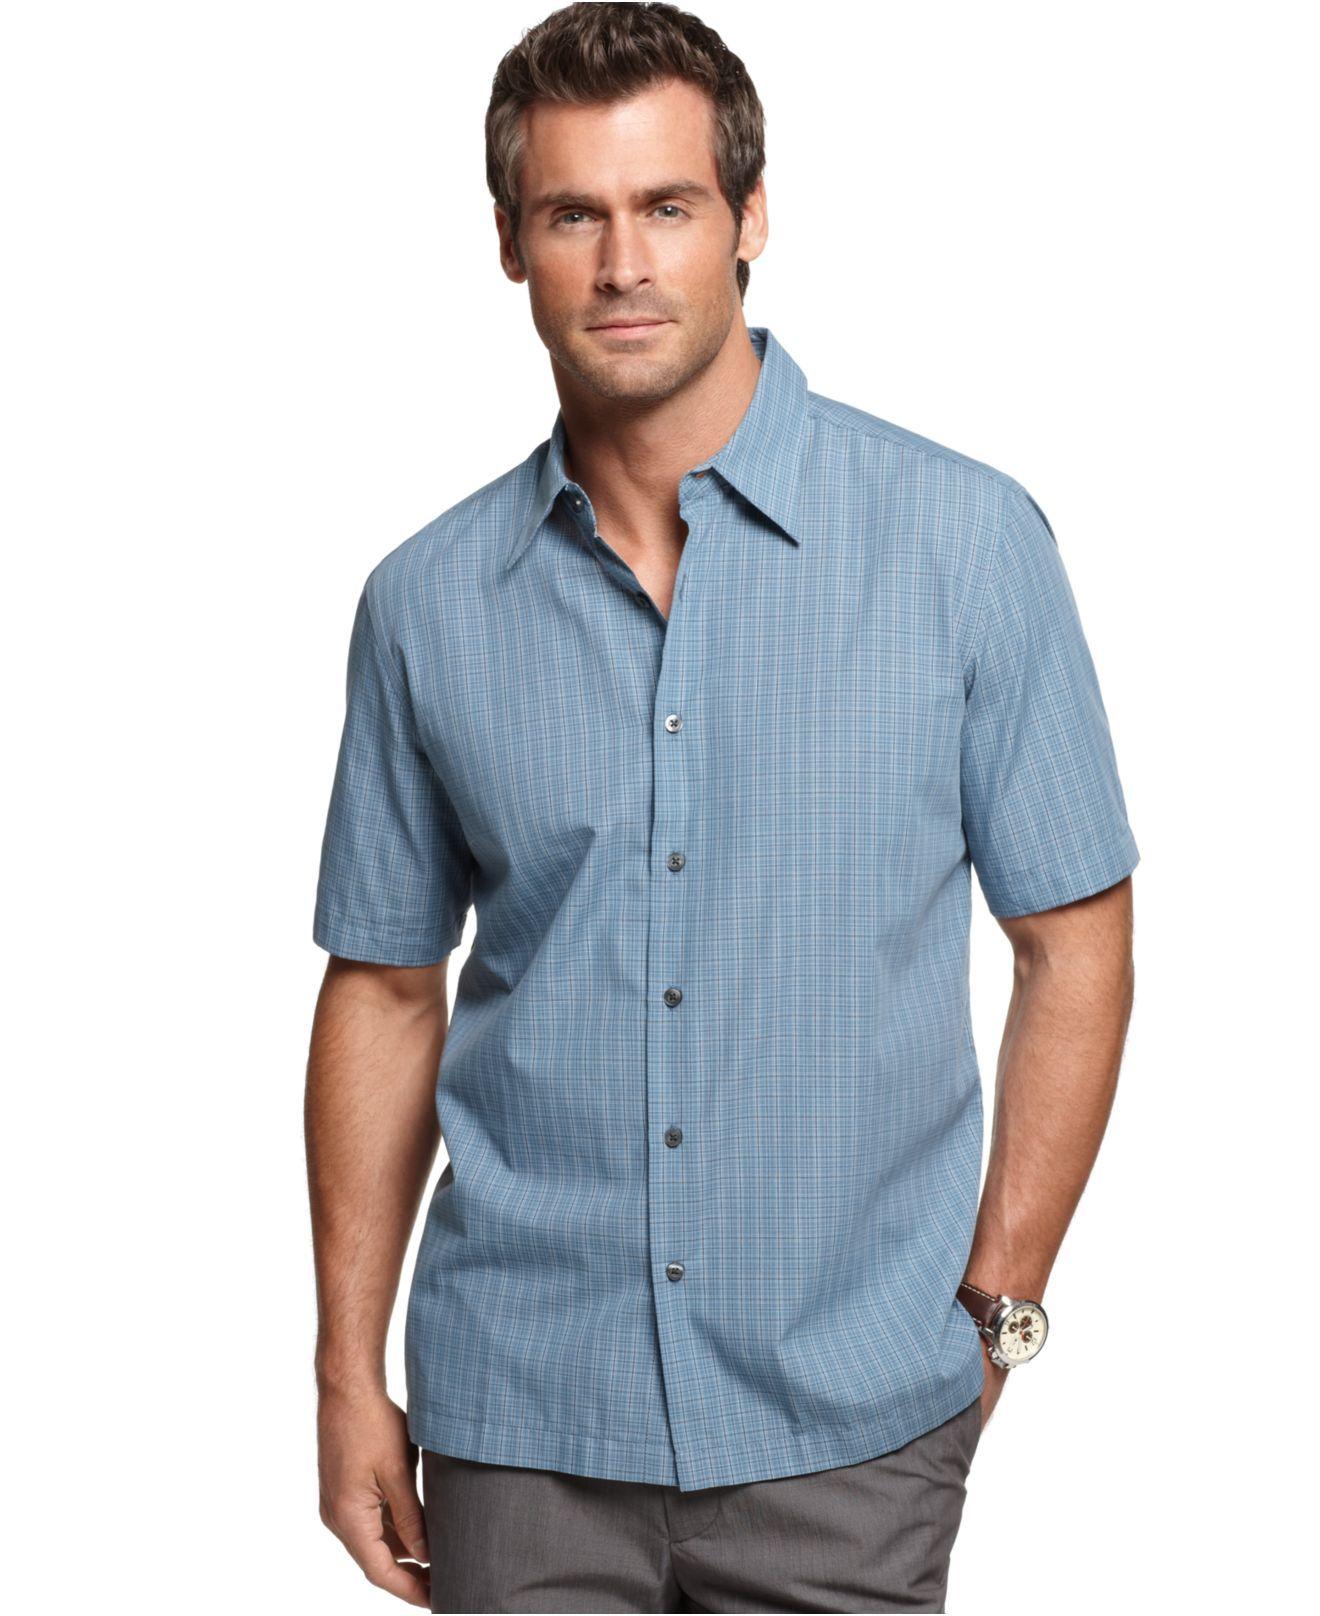 bd0ea264b1ef John Ashford Shirt, Mineral Plaid Shirt - Mens Casual Shirts - Macy's